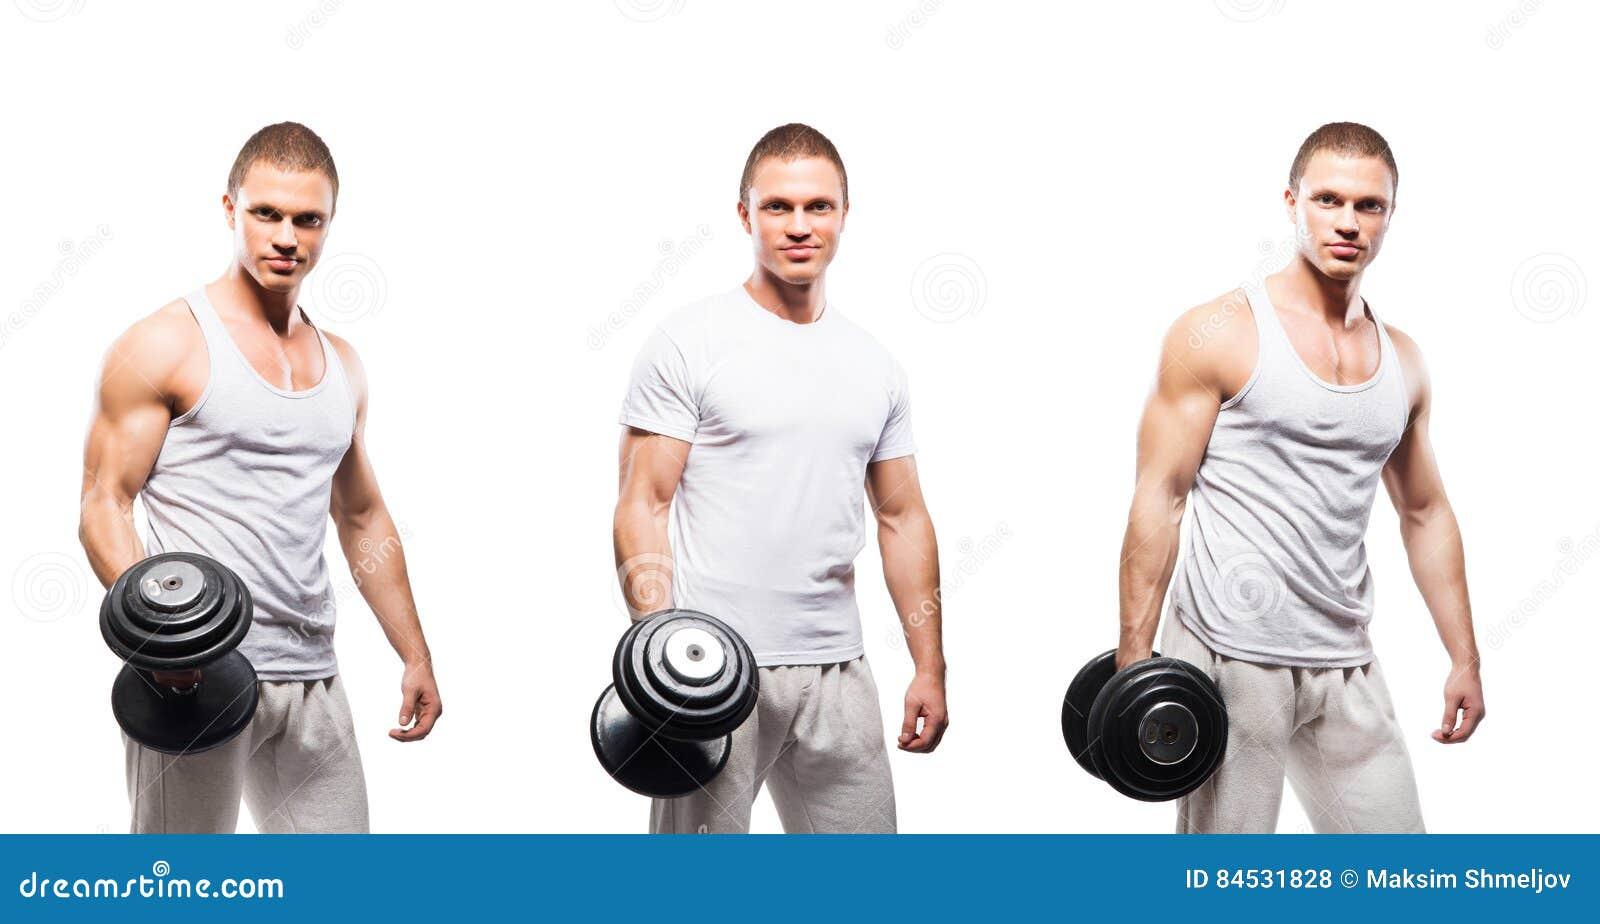 Bei welchem sport männer kennenlernen